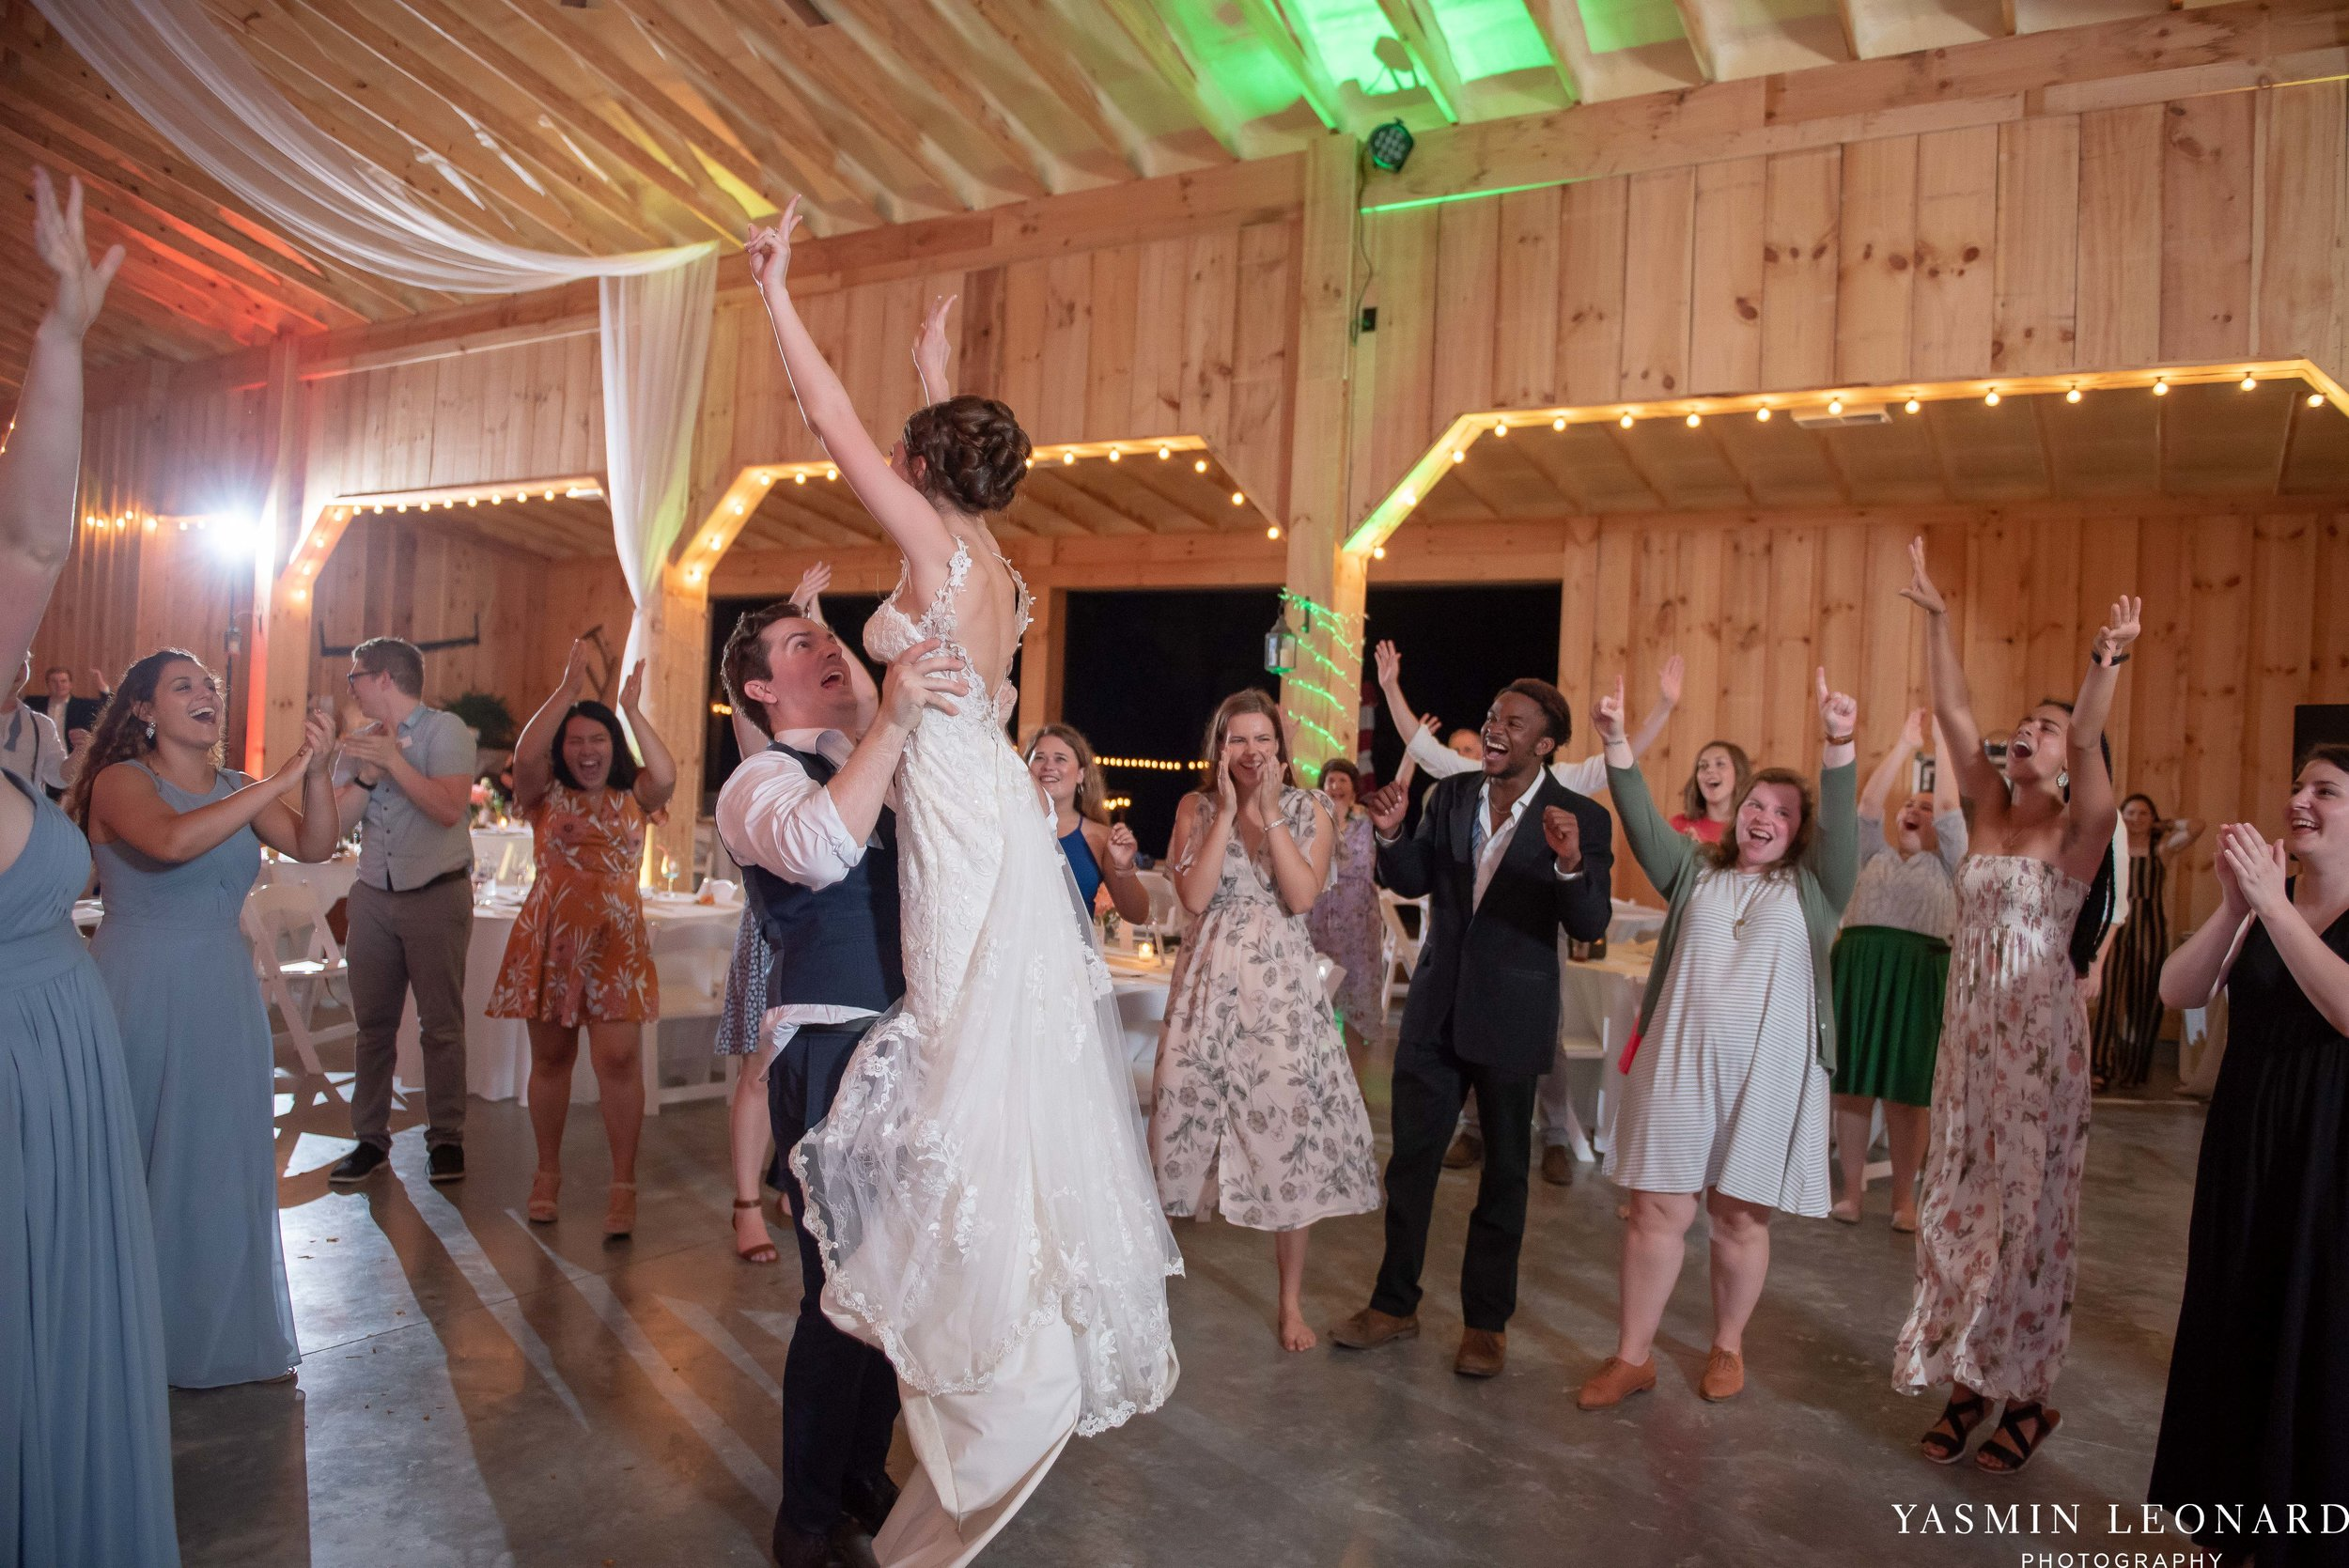 Old Homeplace Vineyard - NC Weddings - Outdoor Summer Weddings - Peony Boutique - Vineyard Wedding - NC Photographer - Yasmin Leonard Photography-79.jpg